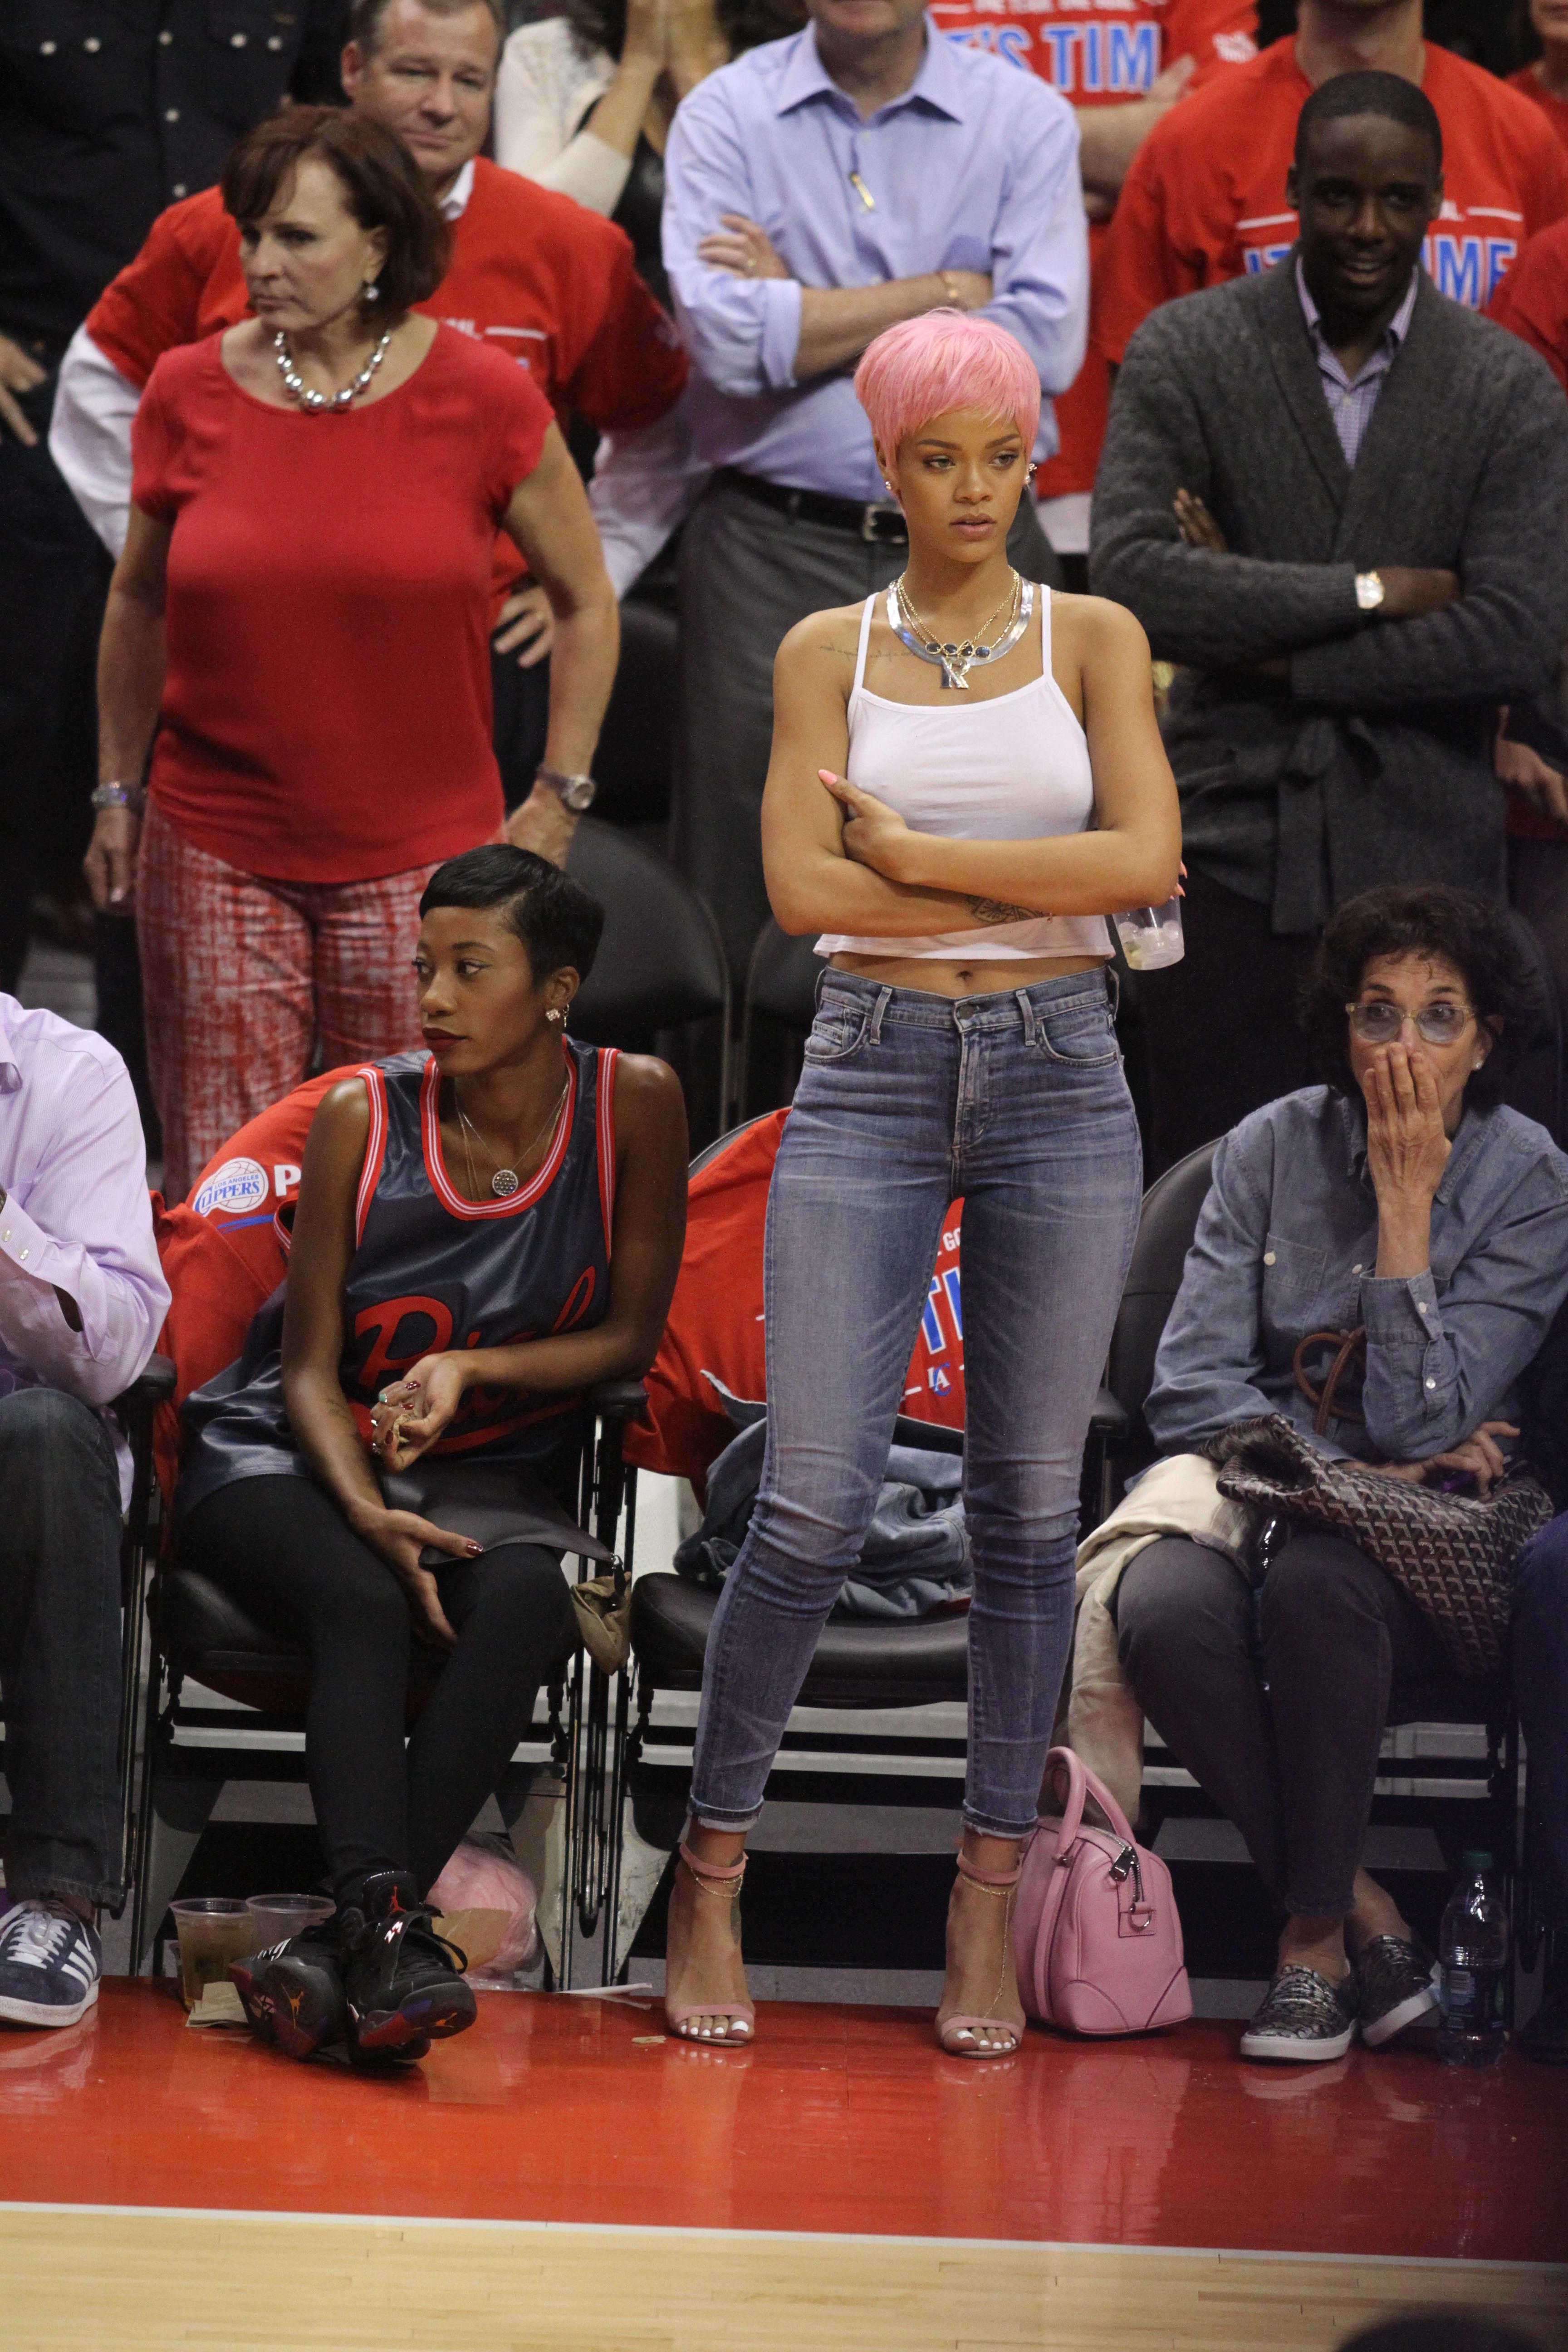 Rihanna Basketball Game Photo The Hollywood Gossip